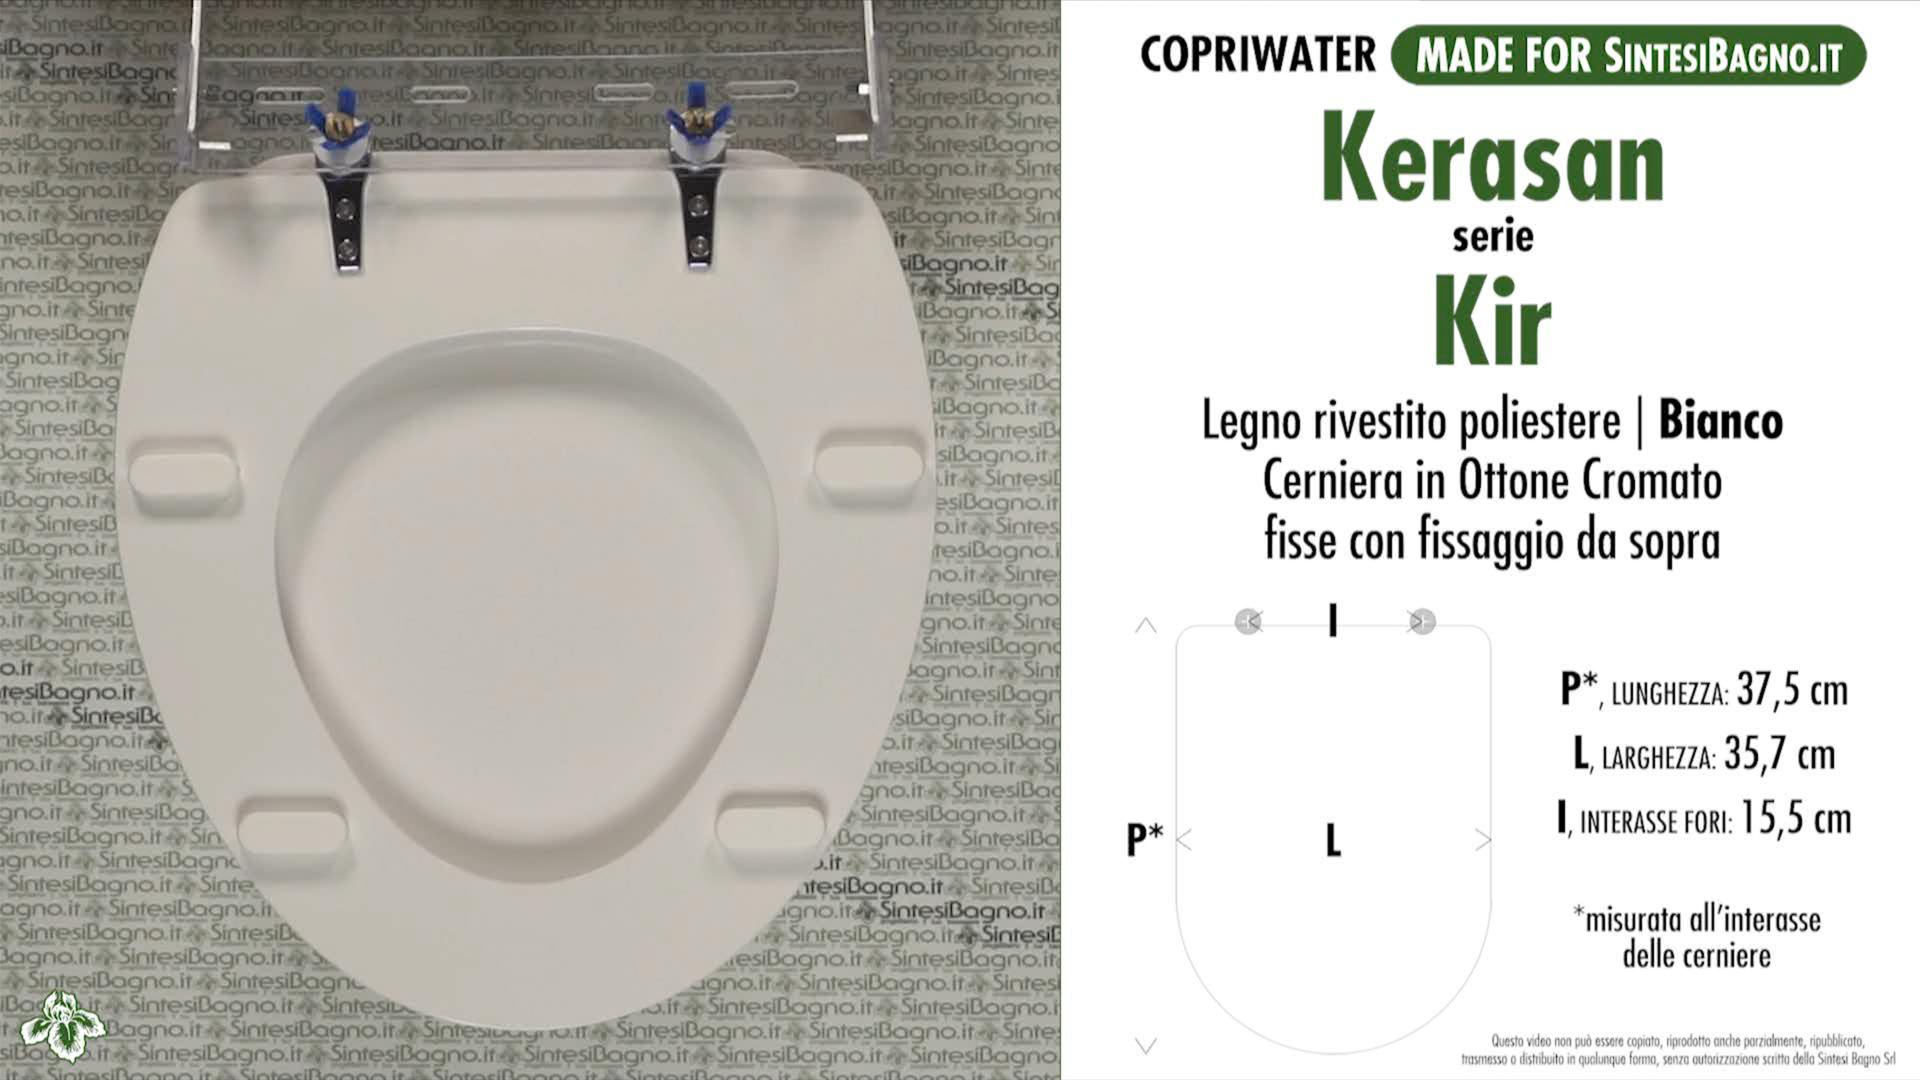 SCHEDA TECNICA MISURE copriwater KERASAN KIR